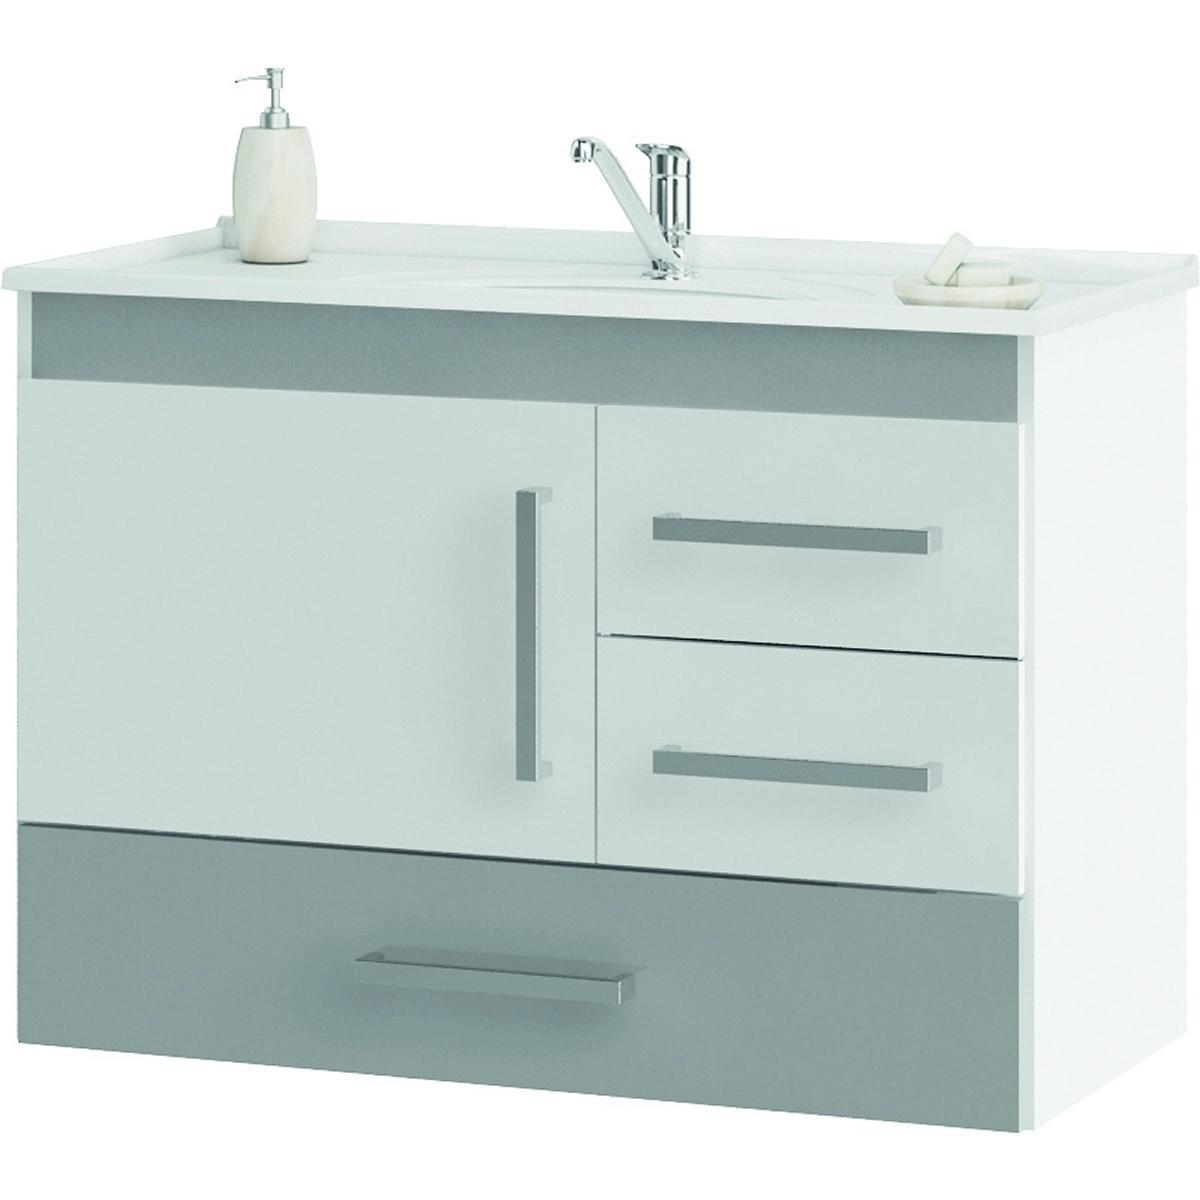 Gabinete de Banheiro Madri - Branco/Cinza Grey - Mgm